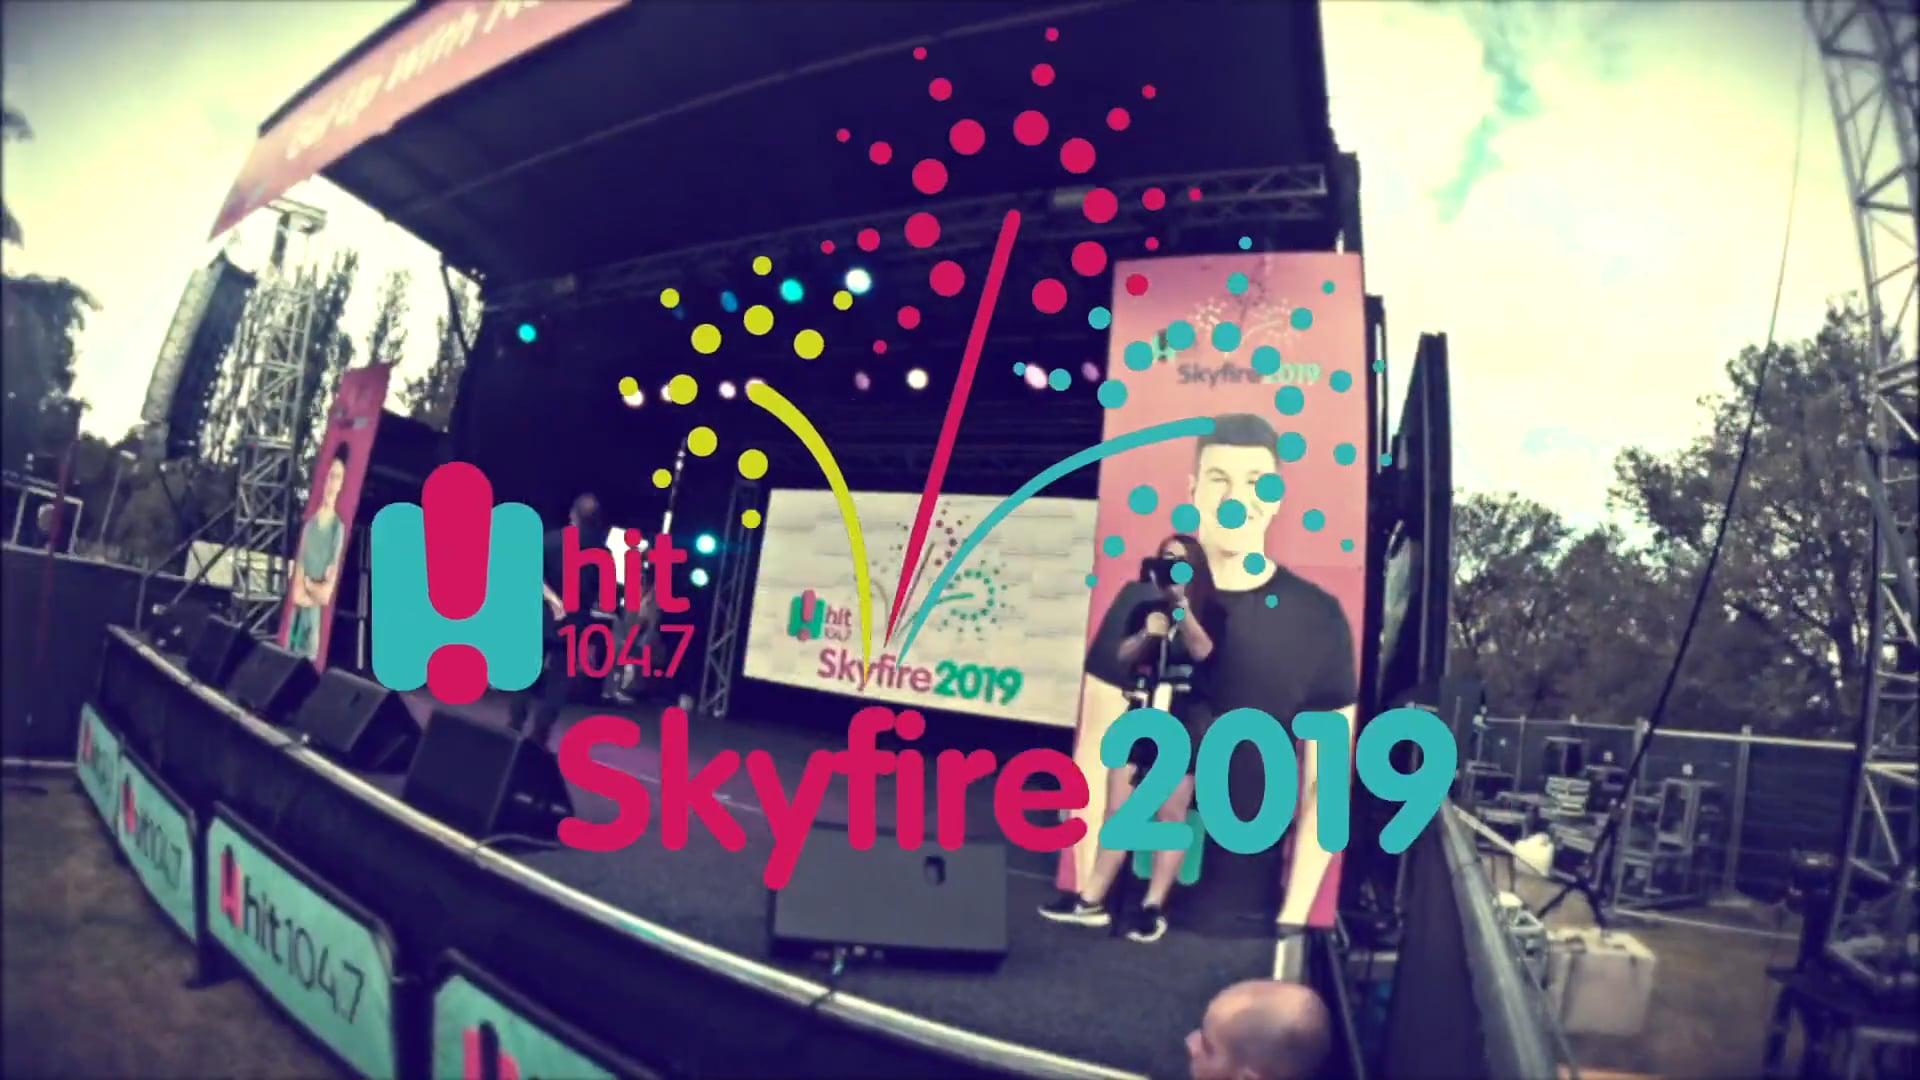 Hit104.7's Skyfire 2019